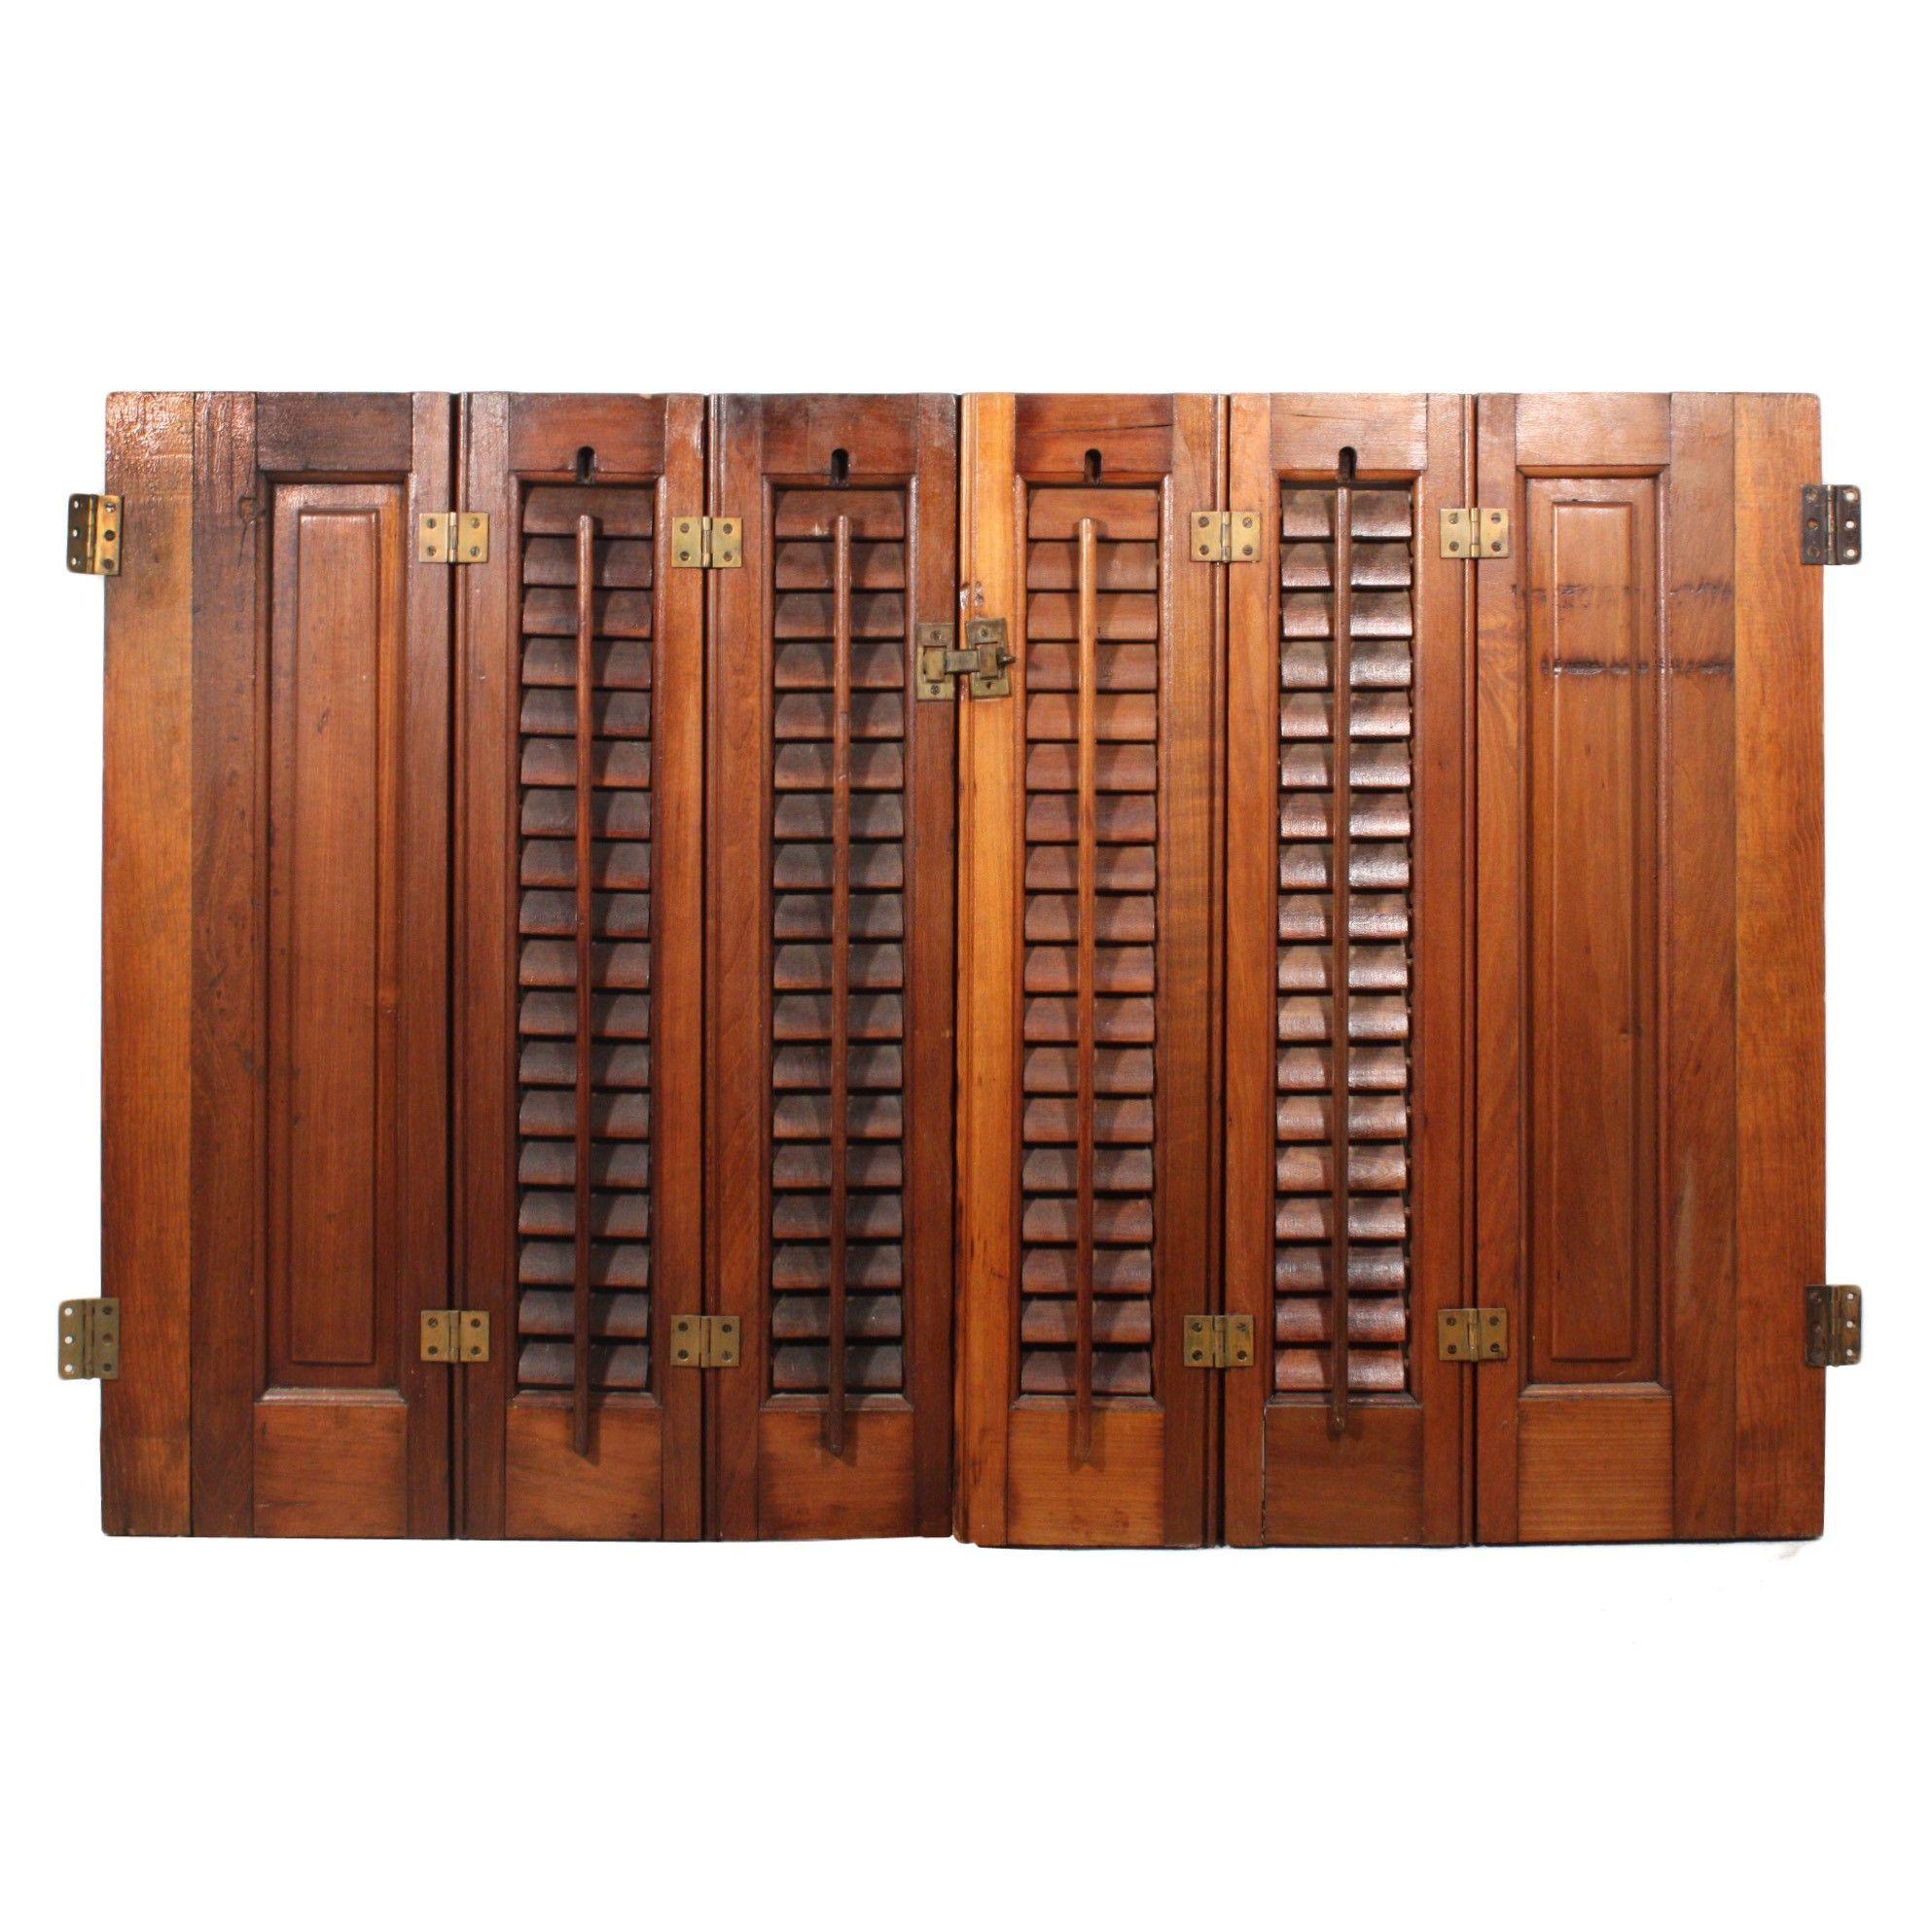 Preservation Station Interior Wood Shutters Antique Interior Interior Shutters